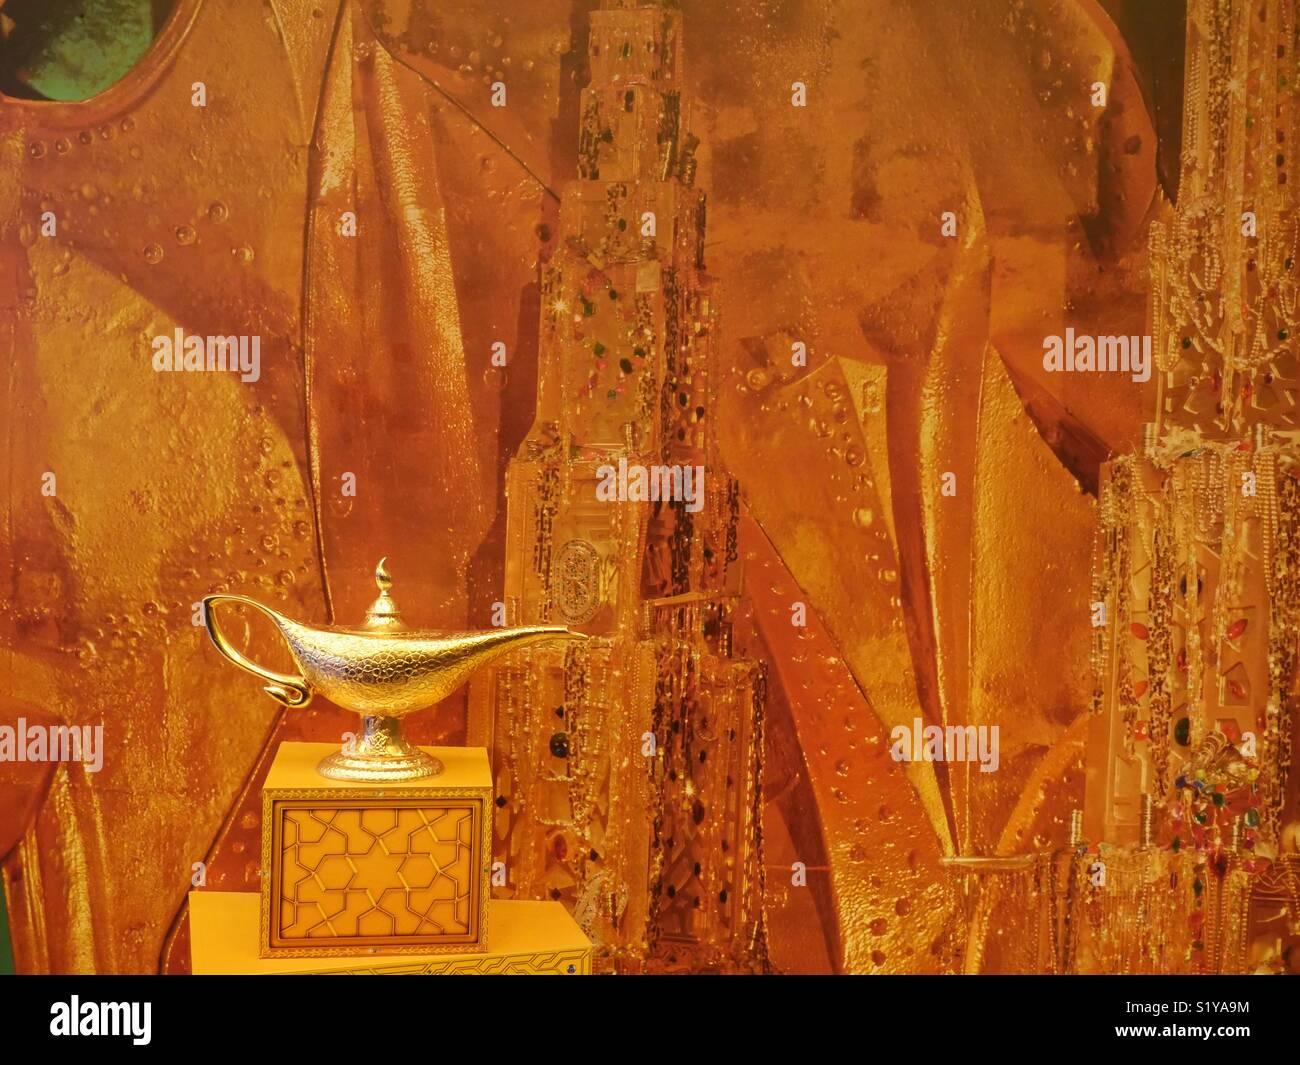 Aladdin's lamp, theatre prop, New York, USA Stock Photo